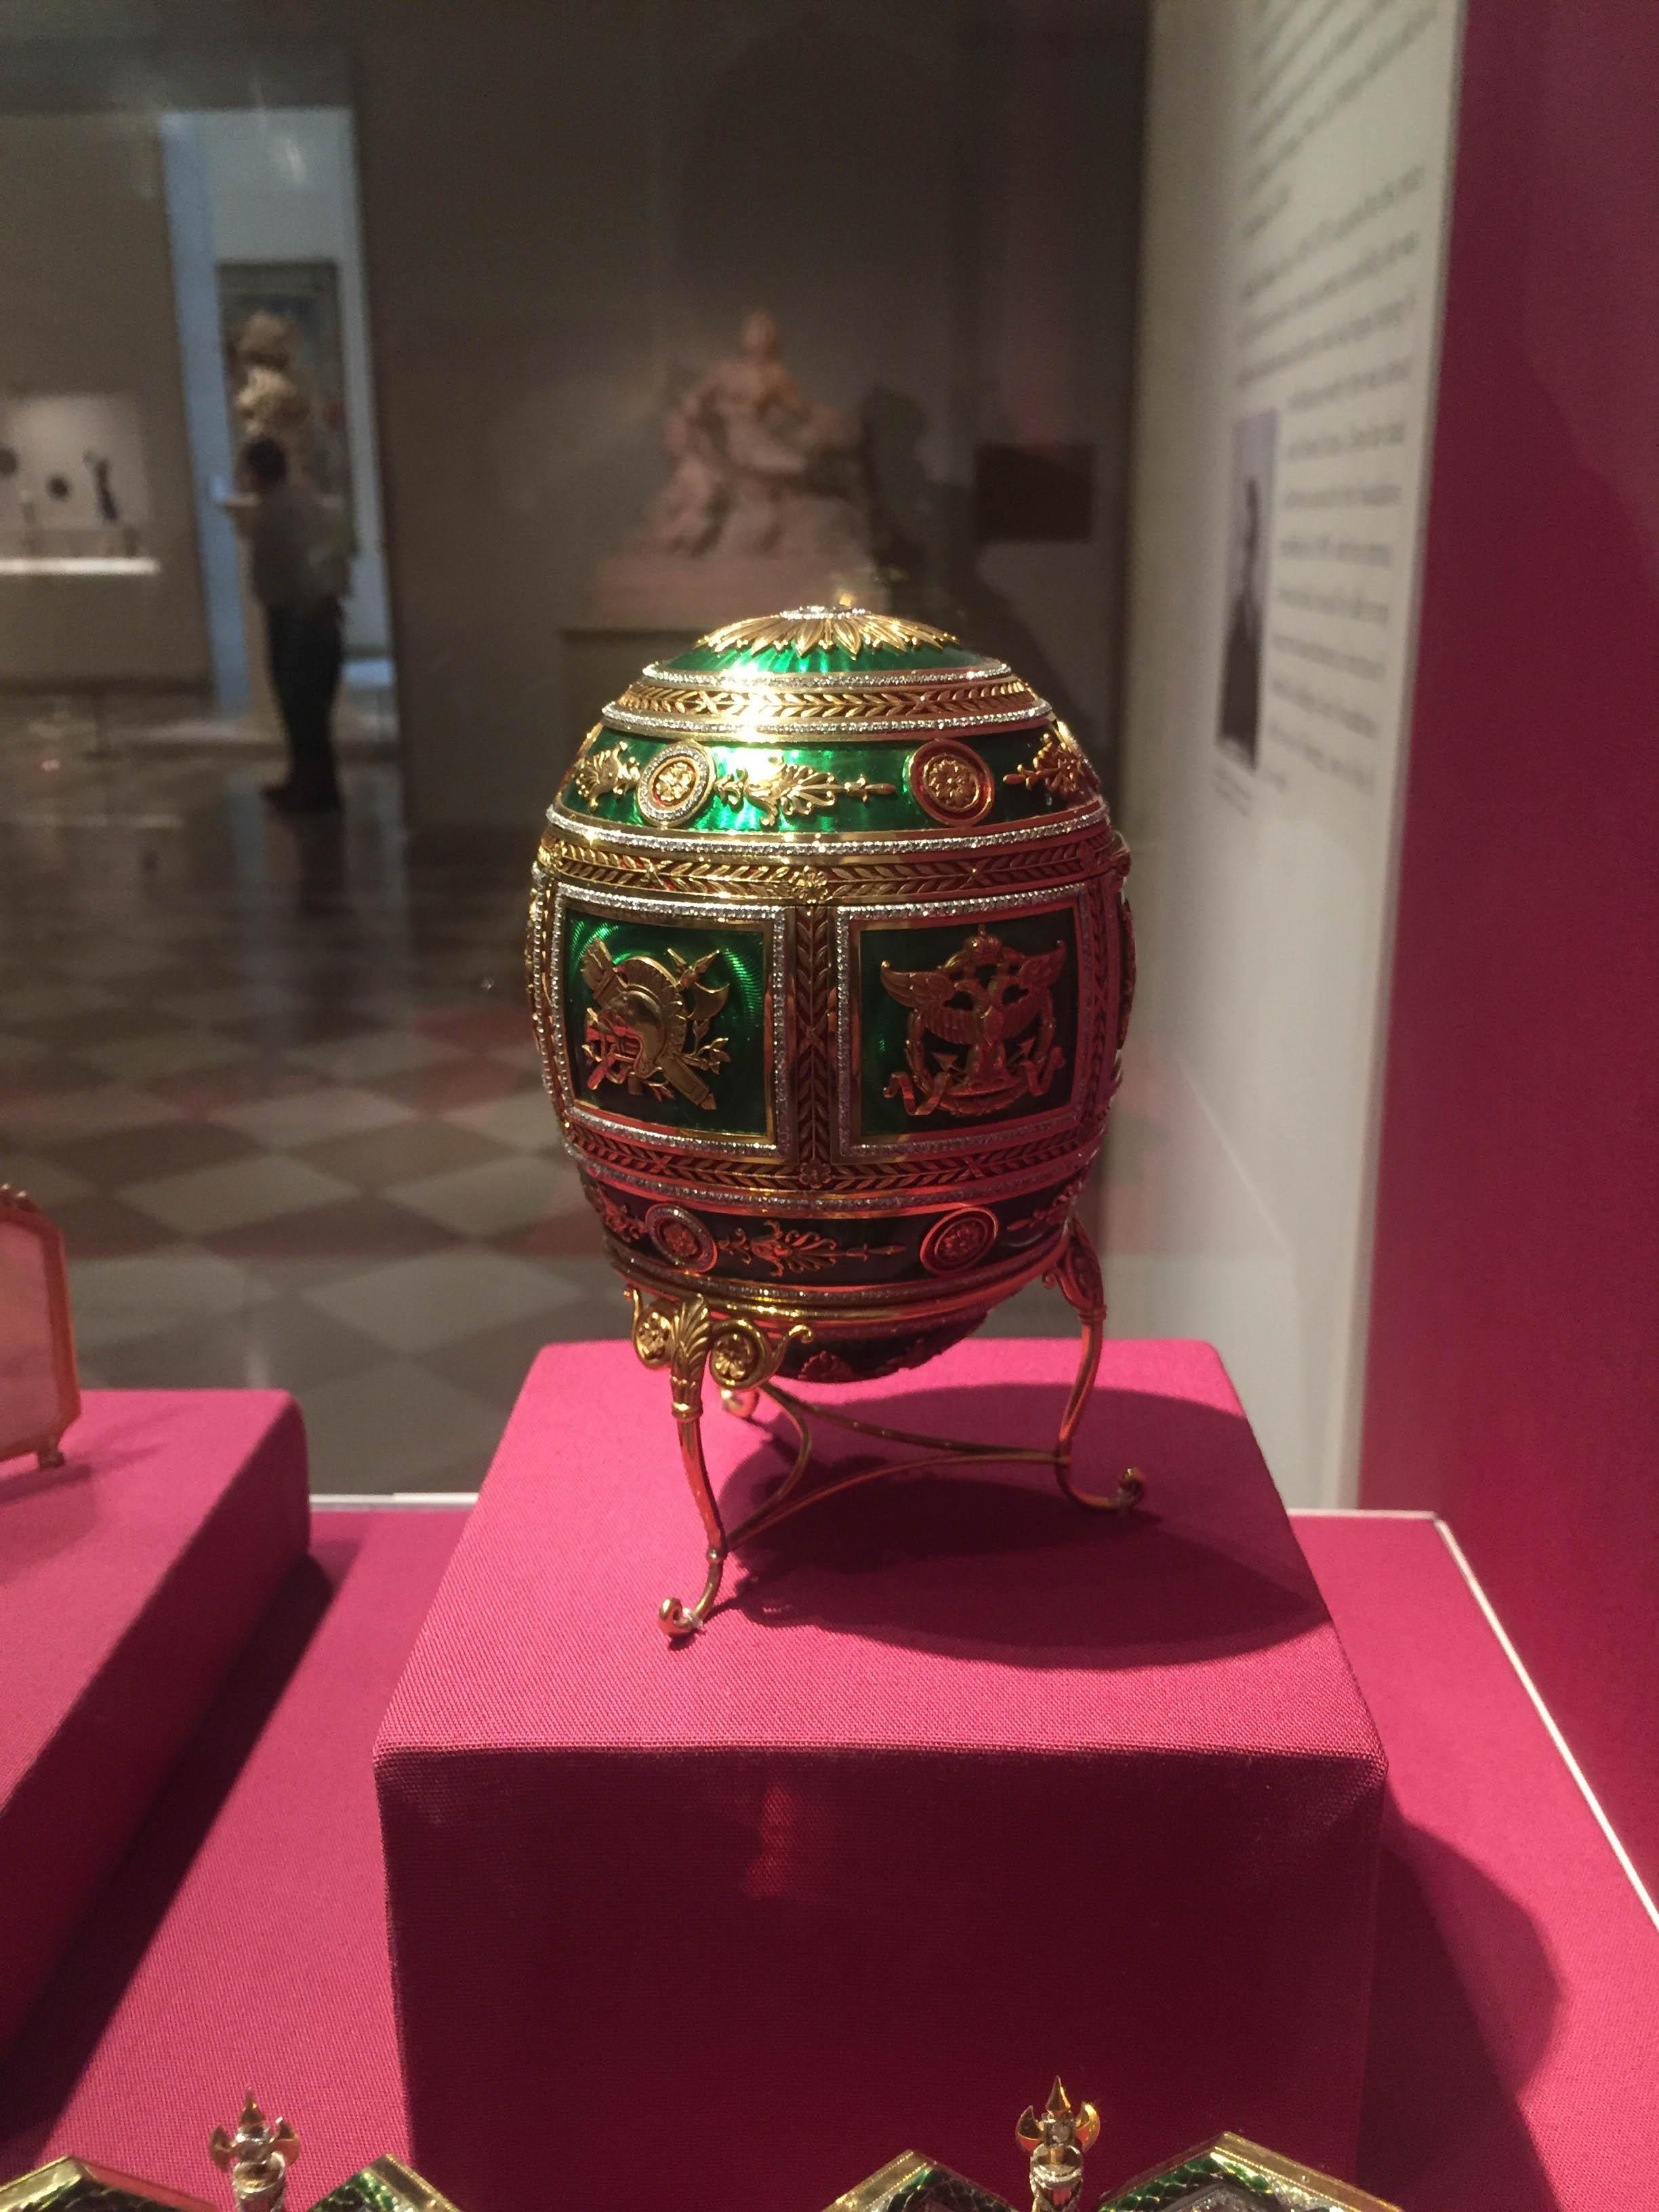 James Bond New York Faberge Egg